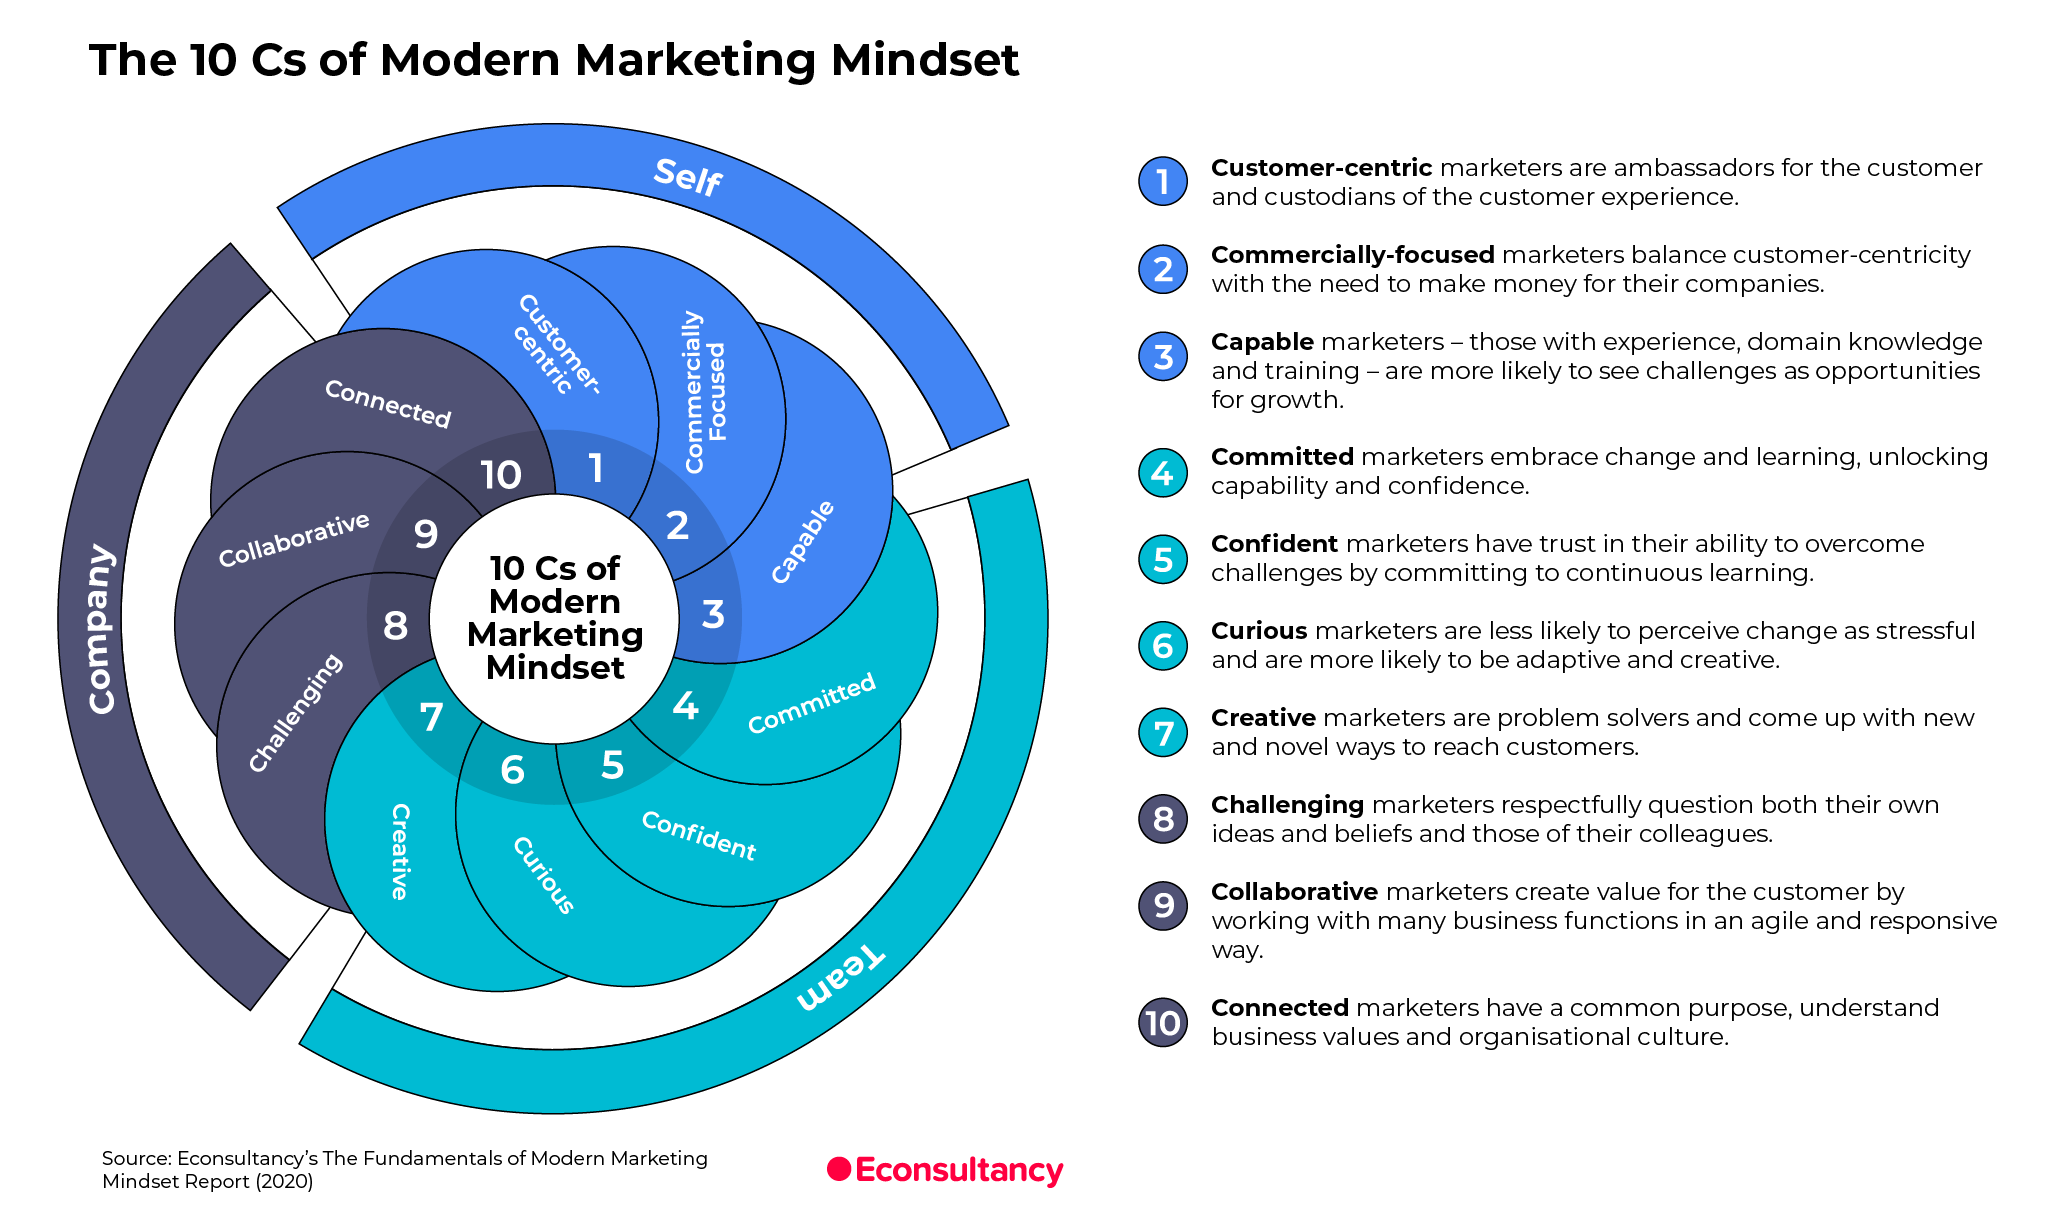 The 10Cs of Modern Marketing Mindset